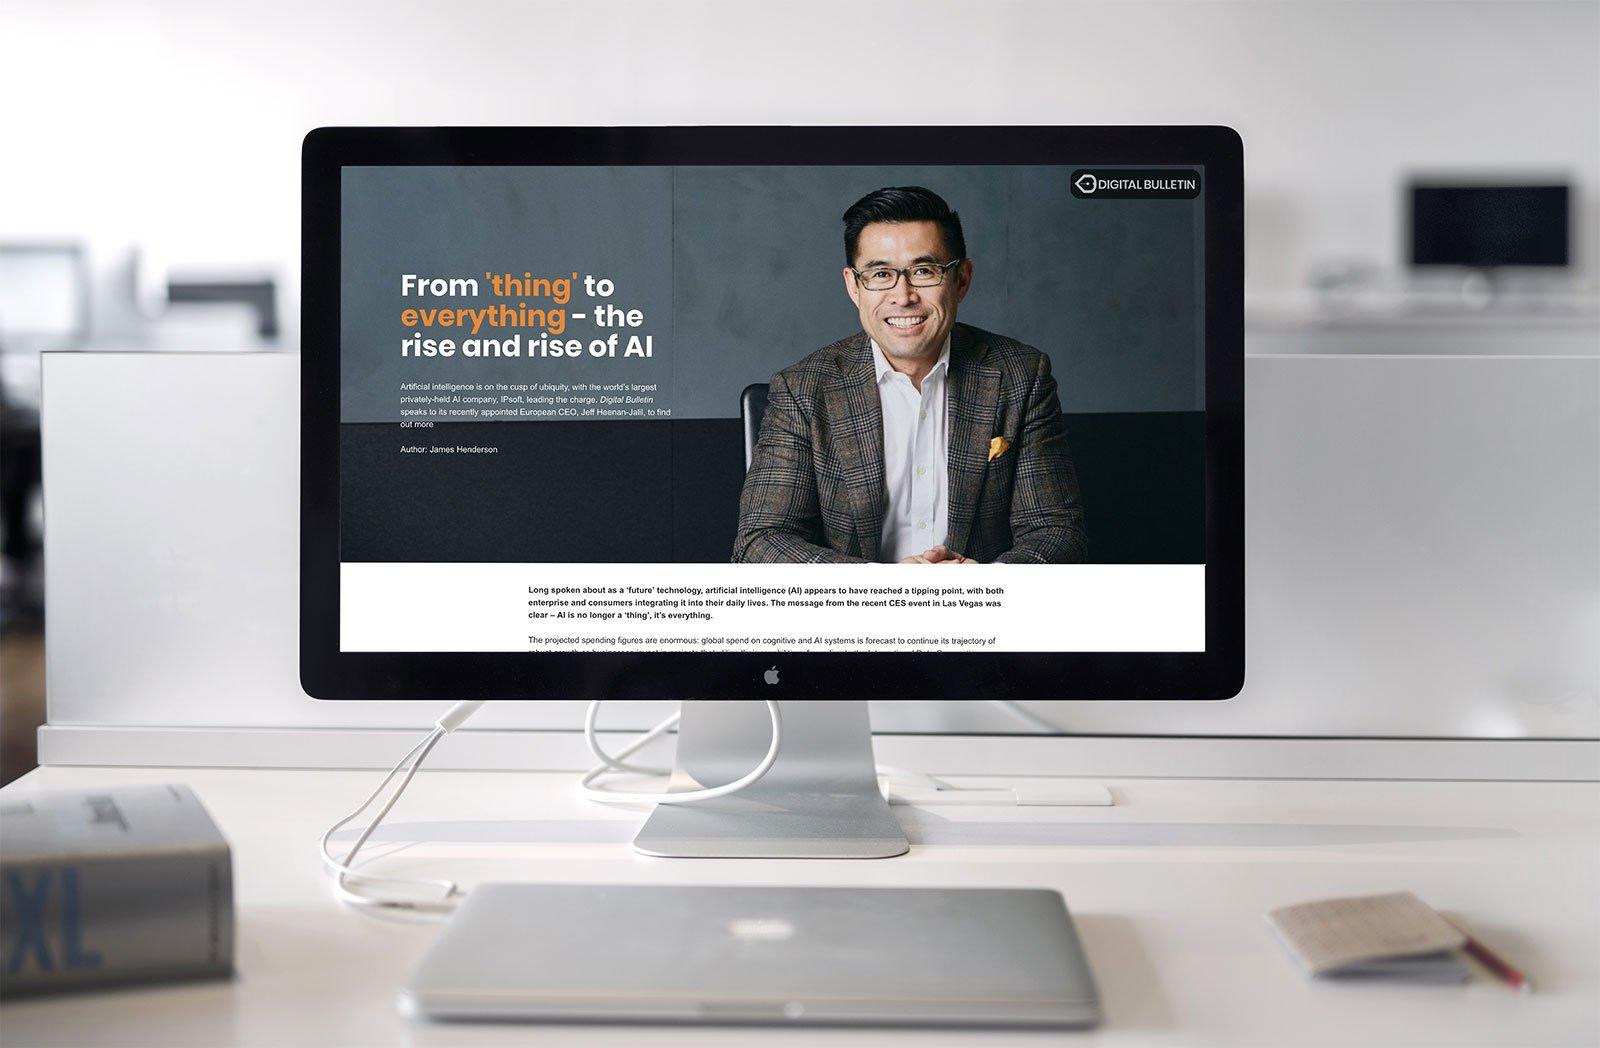 digital-bulletin-desktop-example